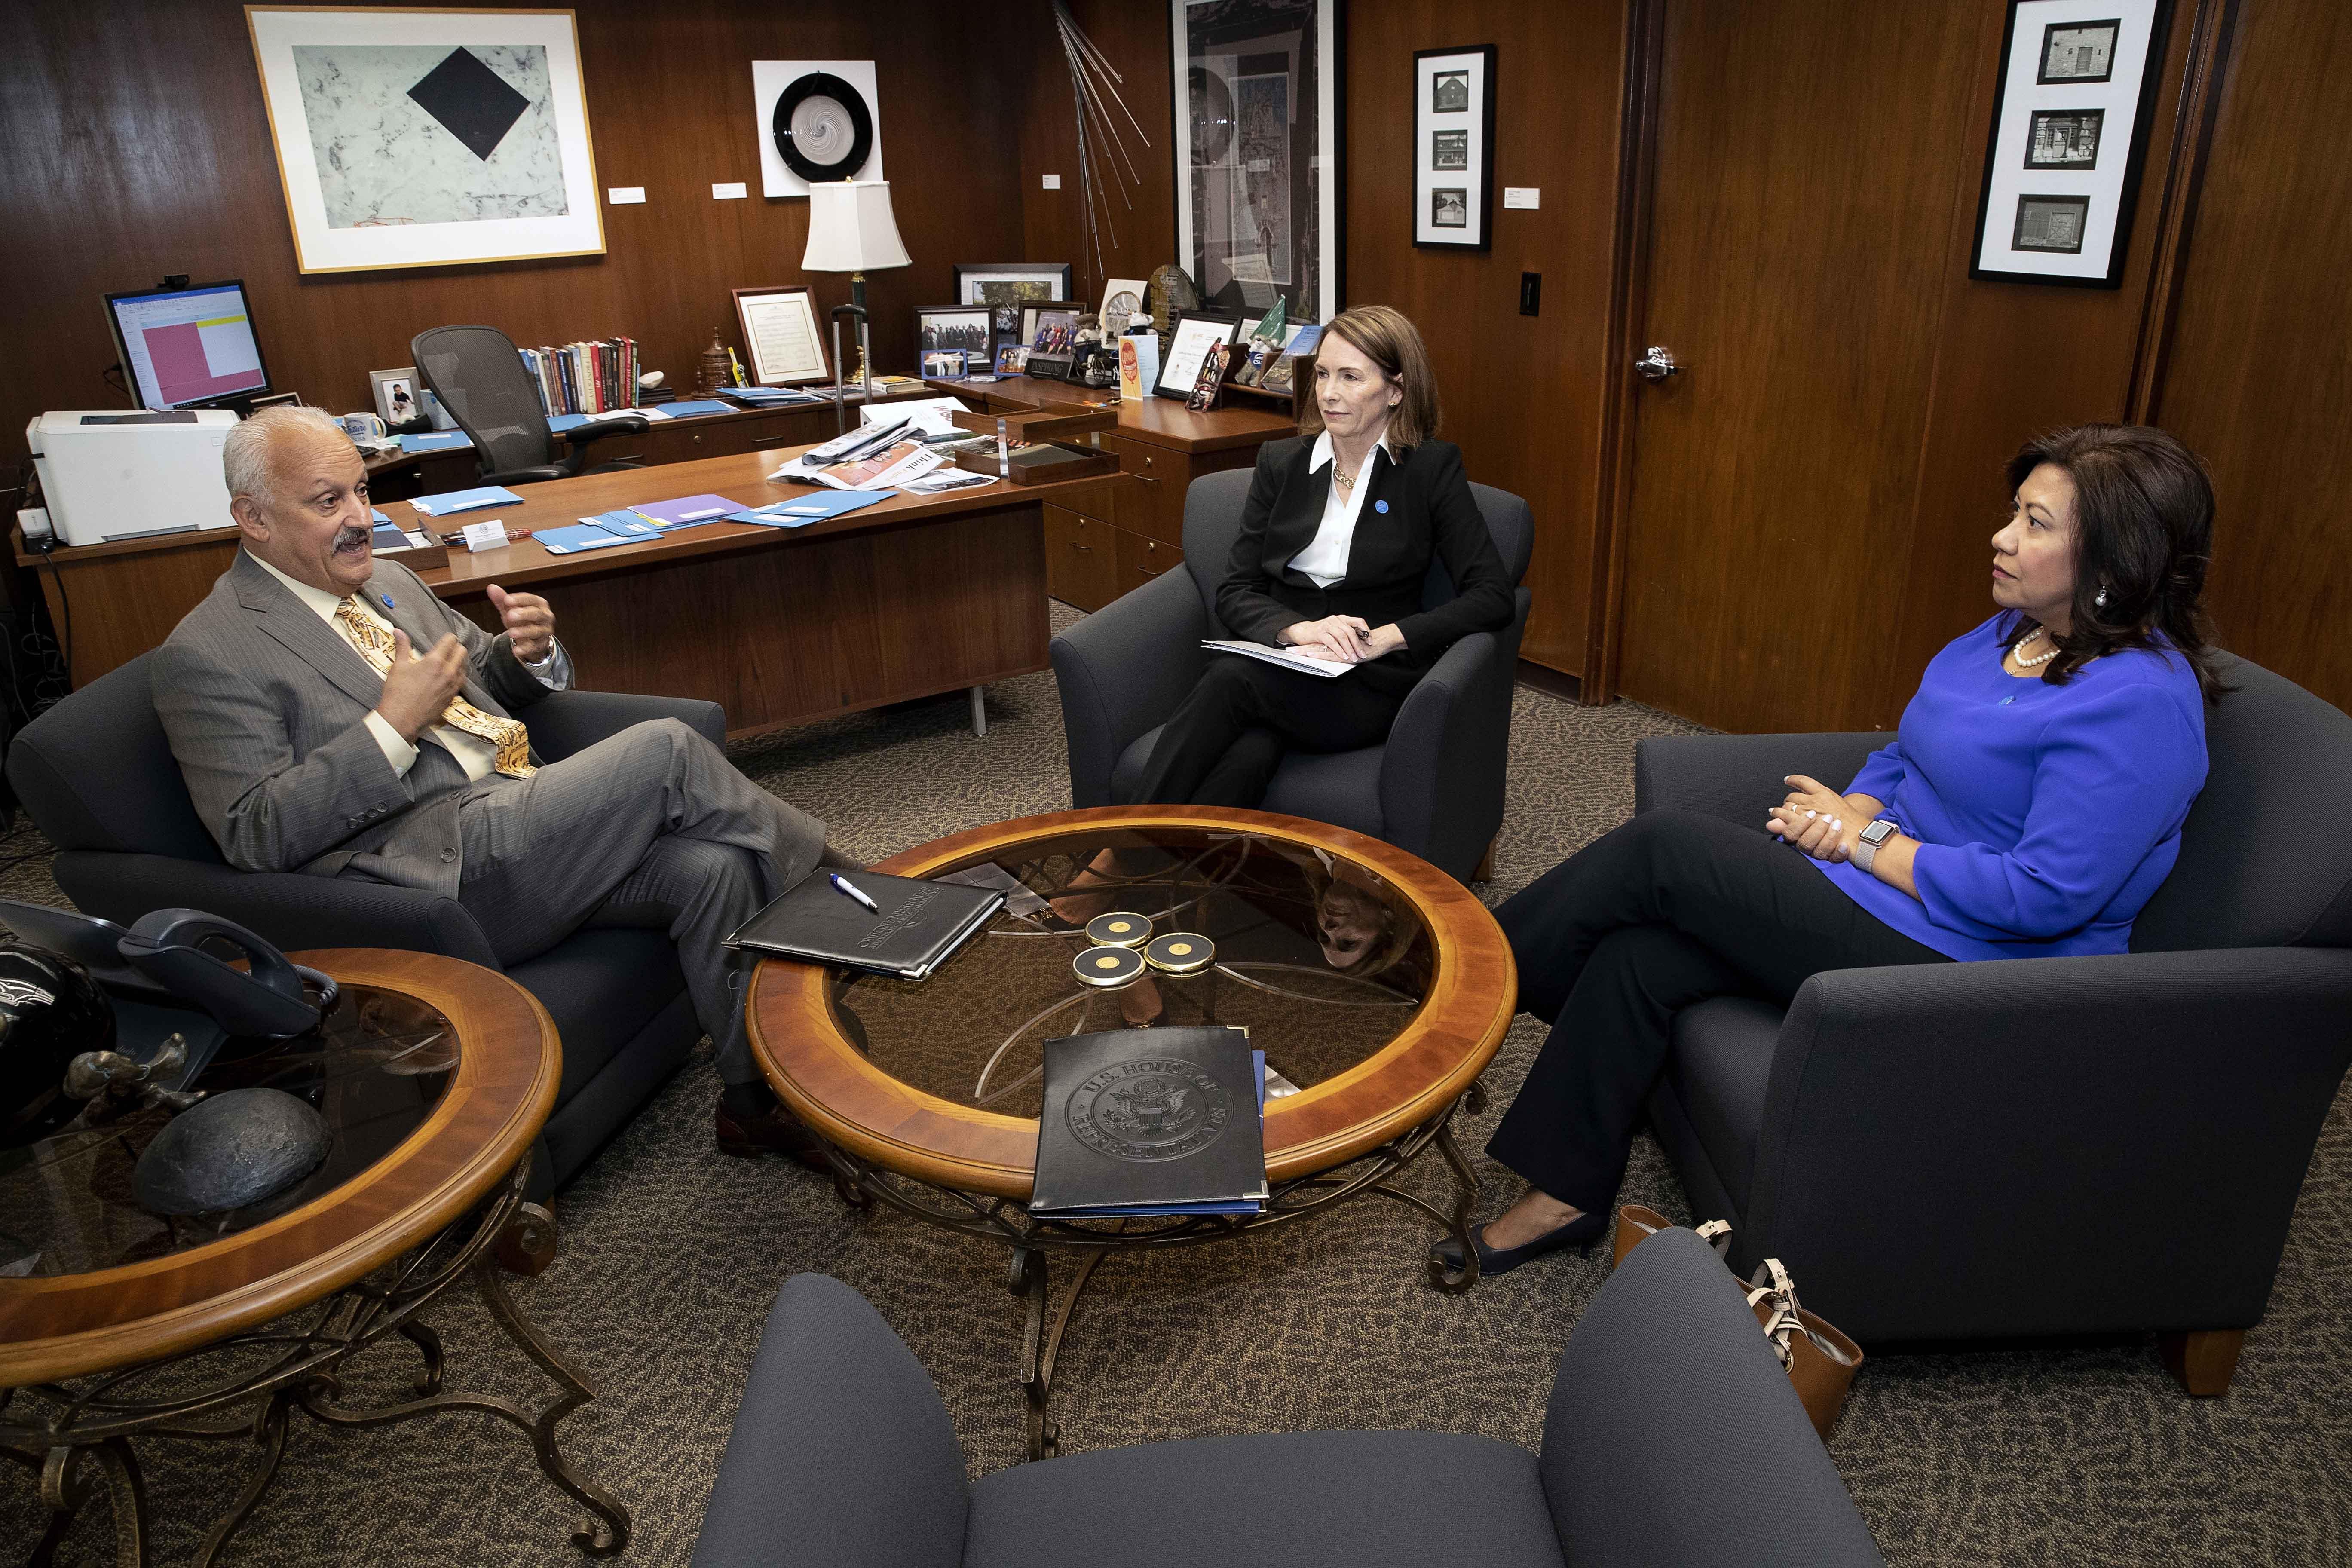 CSUSB President Tomas Morales also met with U.S. Rep Torres